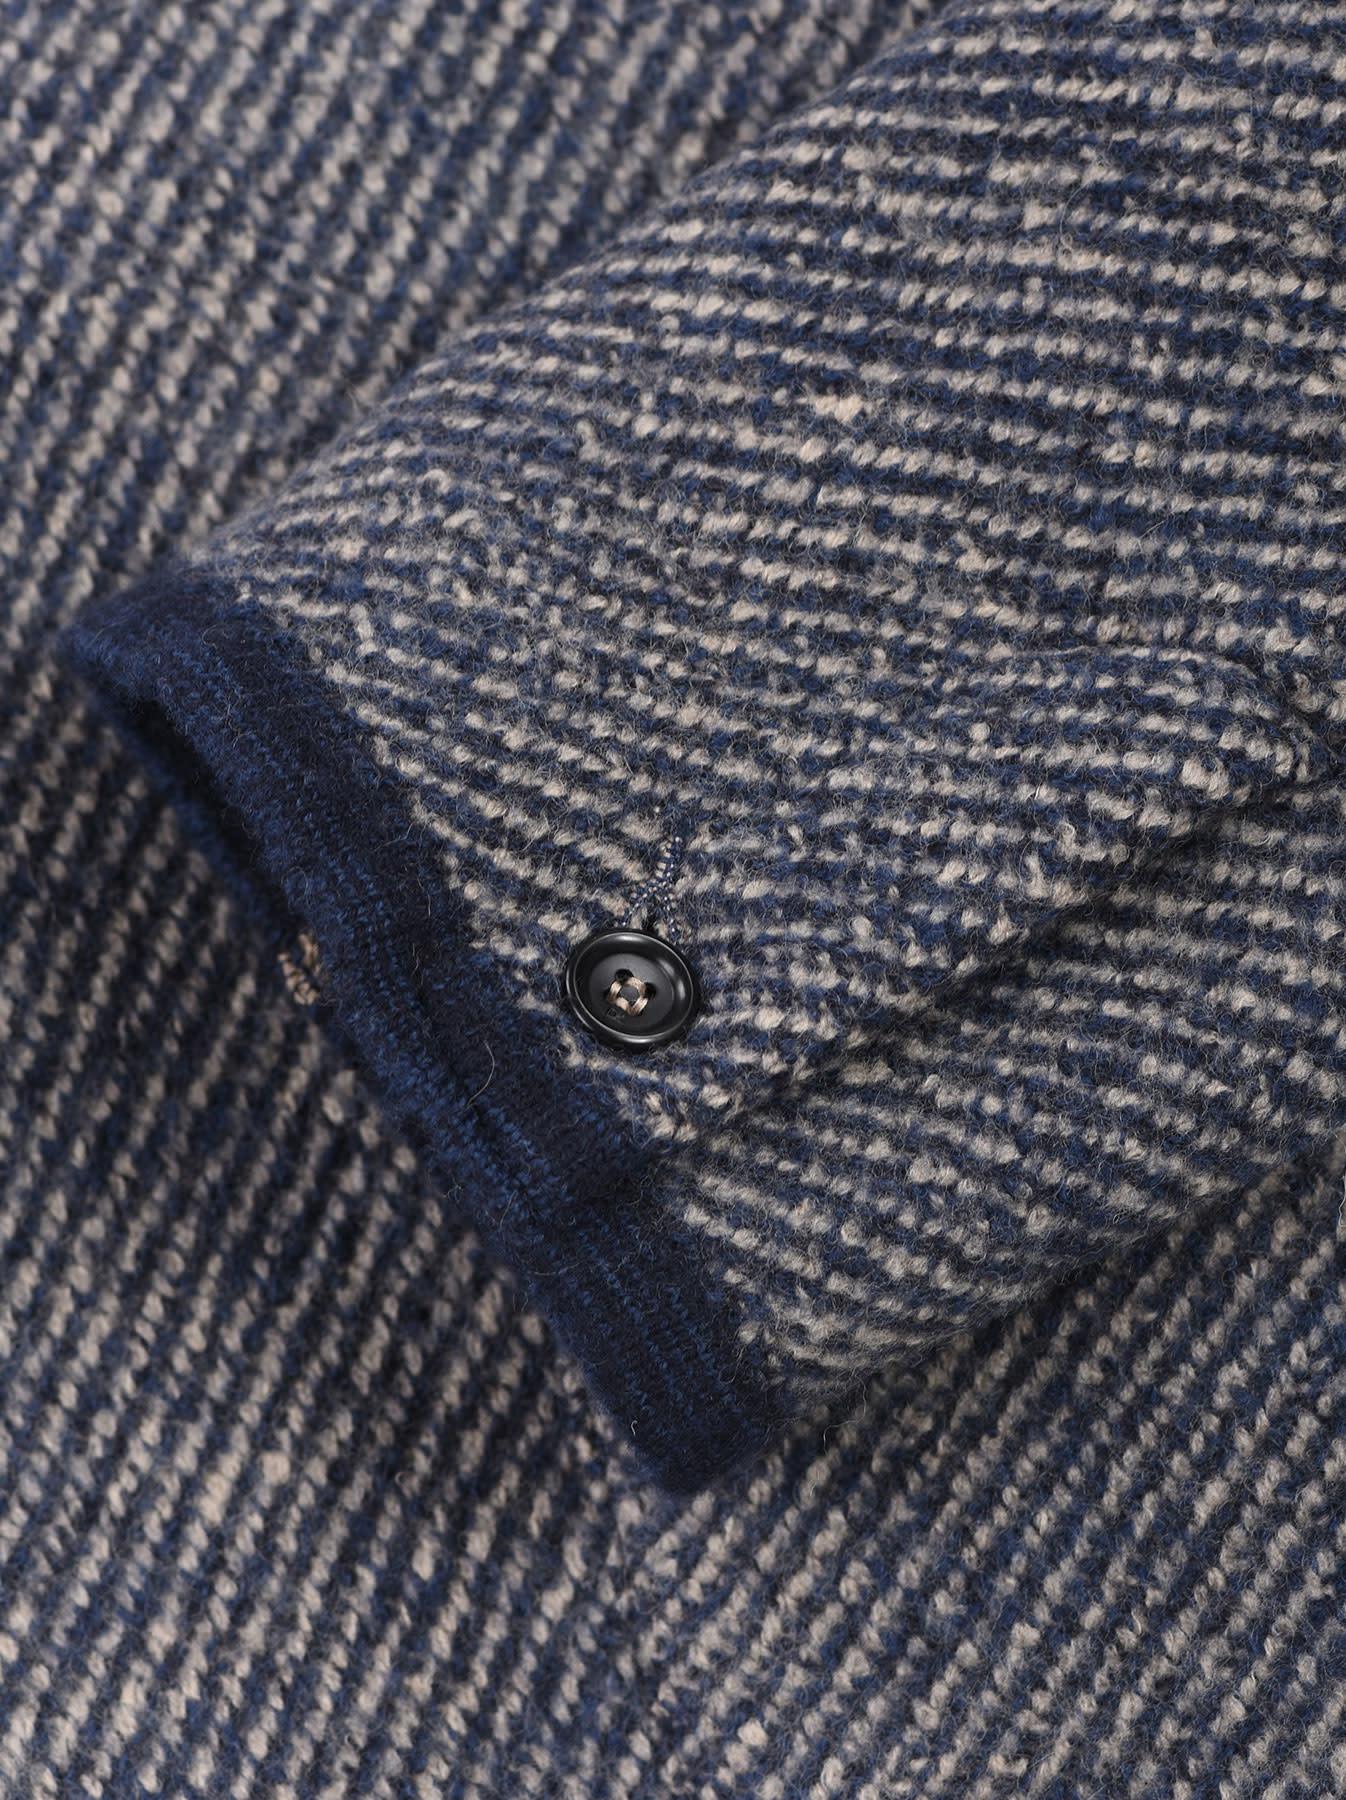 Denim Tweed Knit Jacket-11